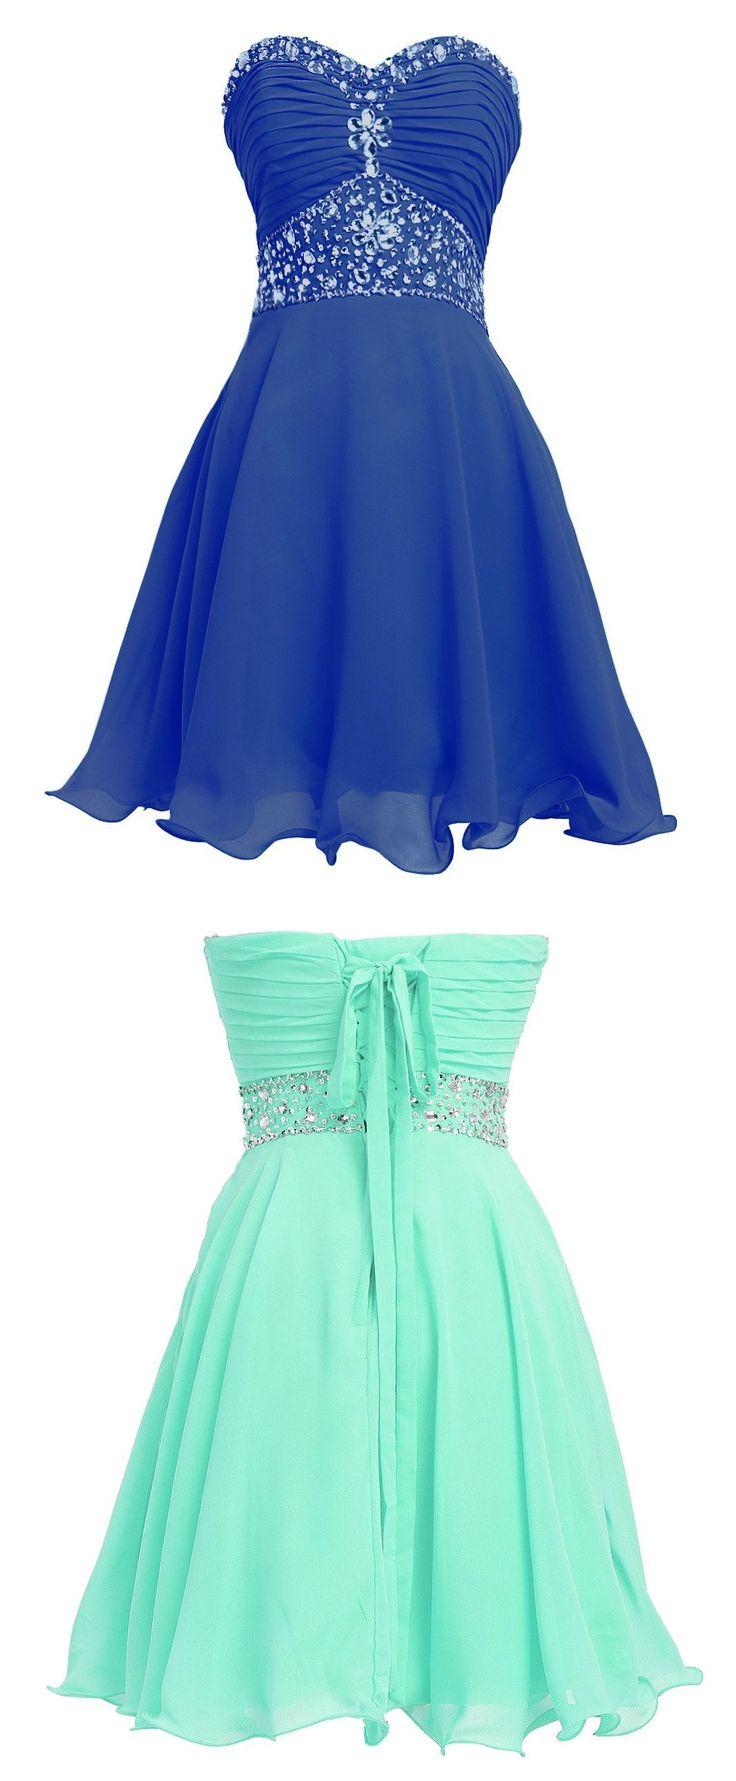 Best 25+ Dresses for juniors ideas on Pinterest   Graduation ...